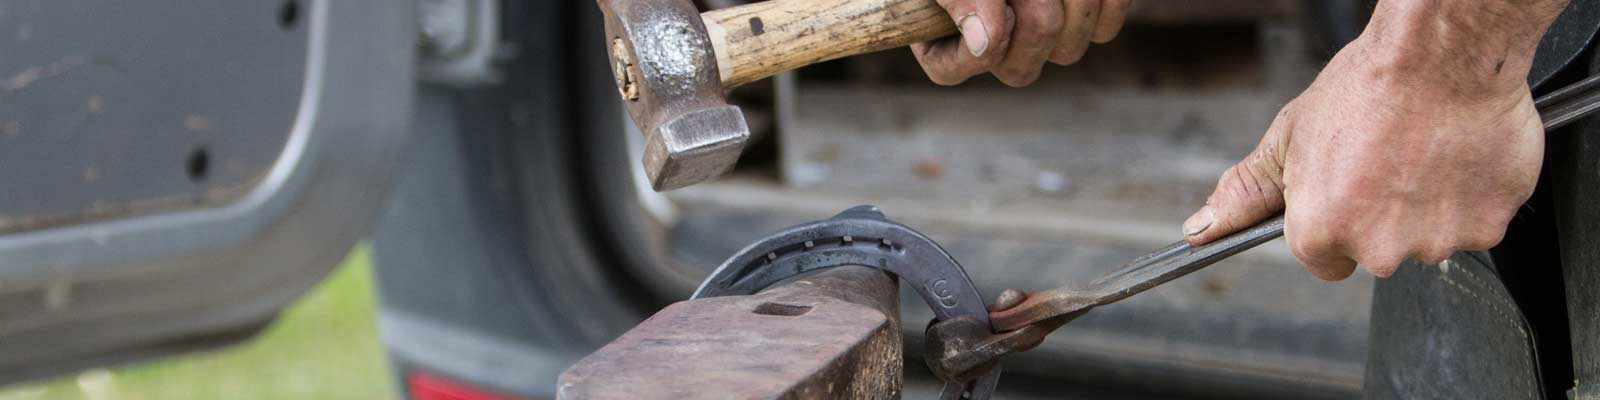 Eisenbearbeitung mit Amboss